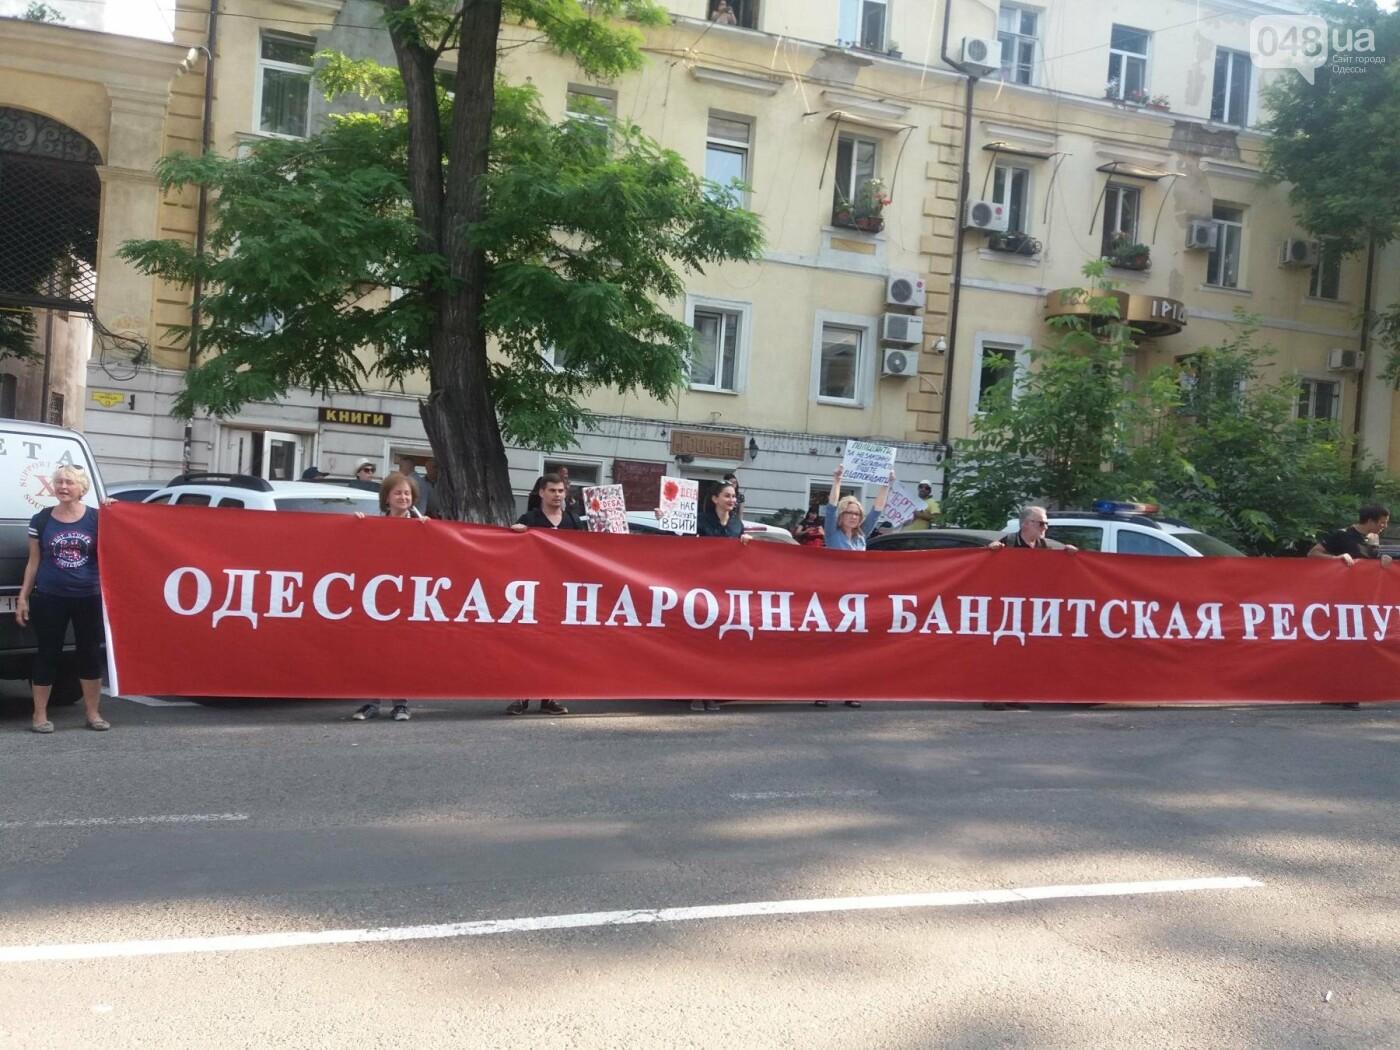 В Одессе протестовали против нападений на активистов и журналистов, - ФОТО, ВИДЕО, фото-6